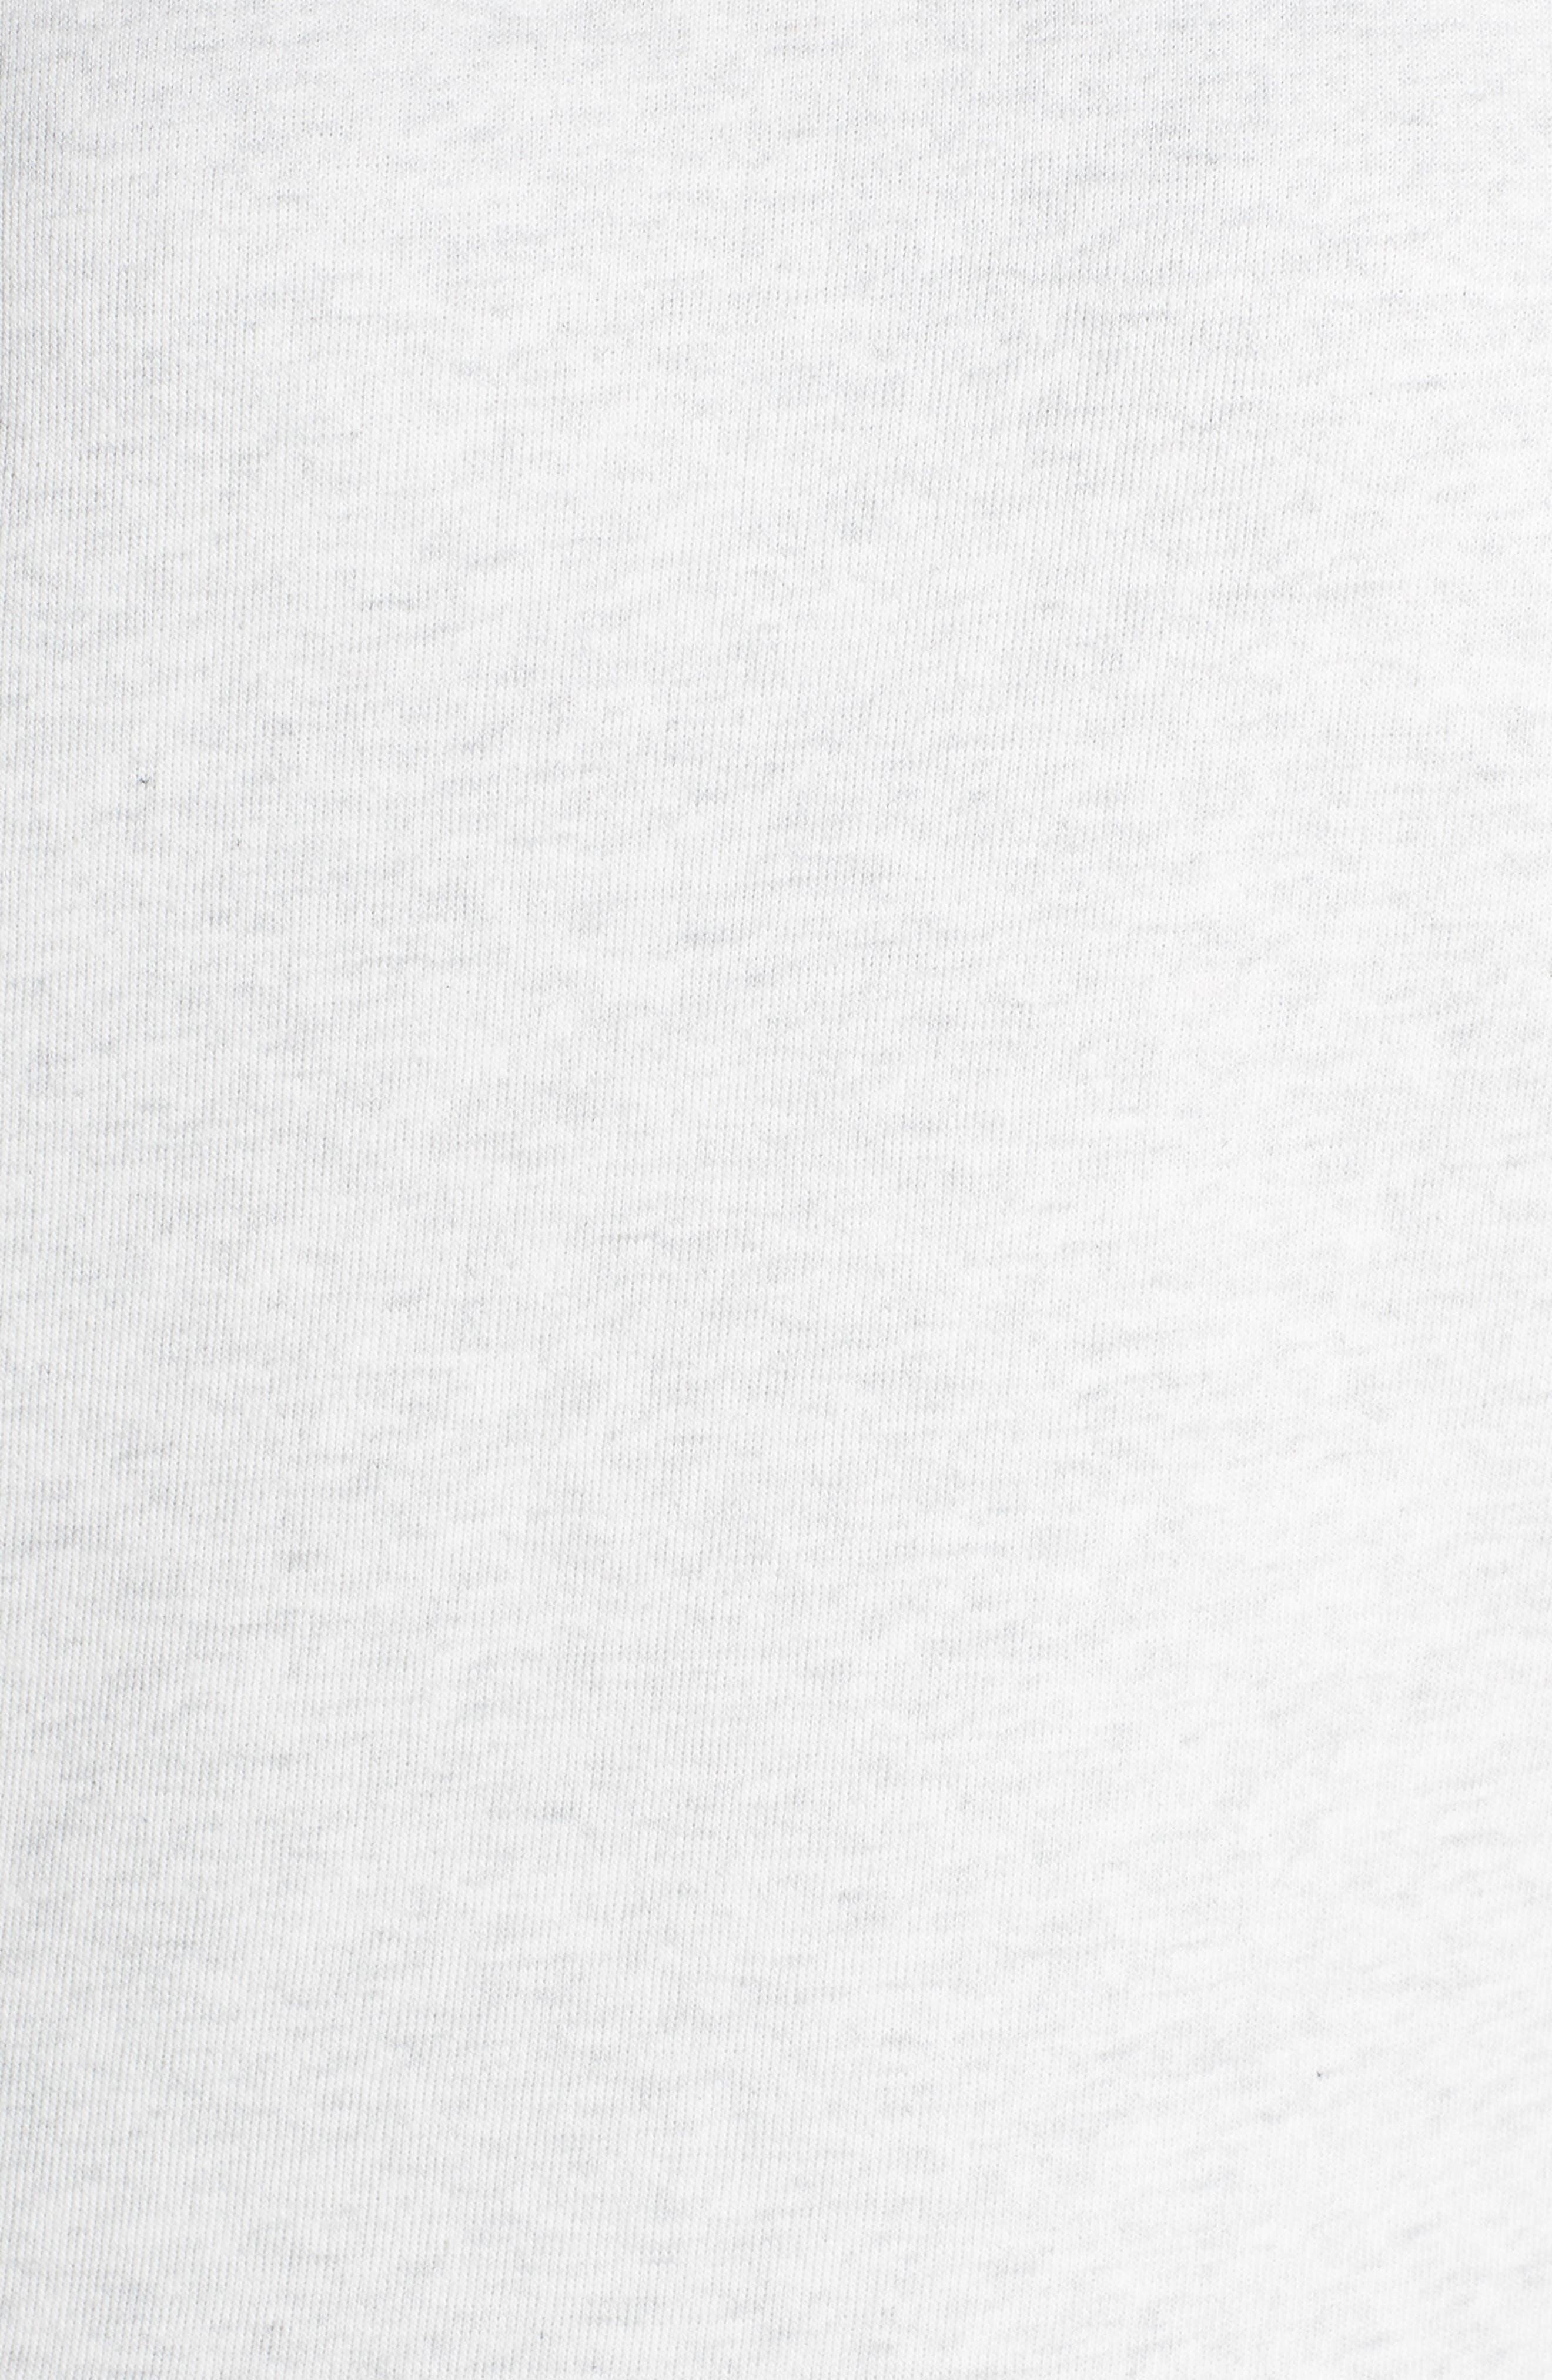 'Haze' Funnel Neck Sweatshirt,                             Alternate thumbnail 6, color,                             WHITE HEATHER